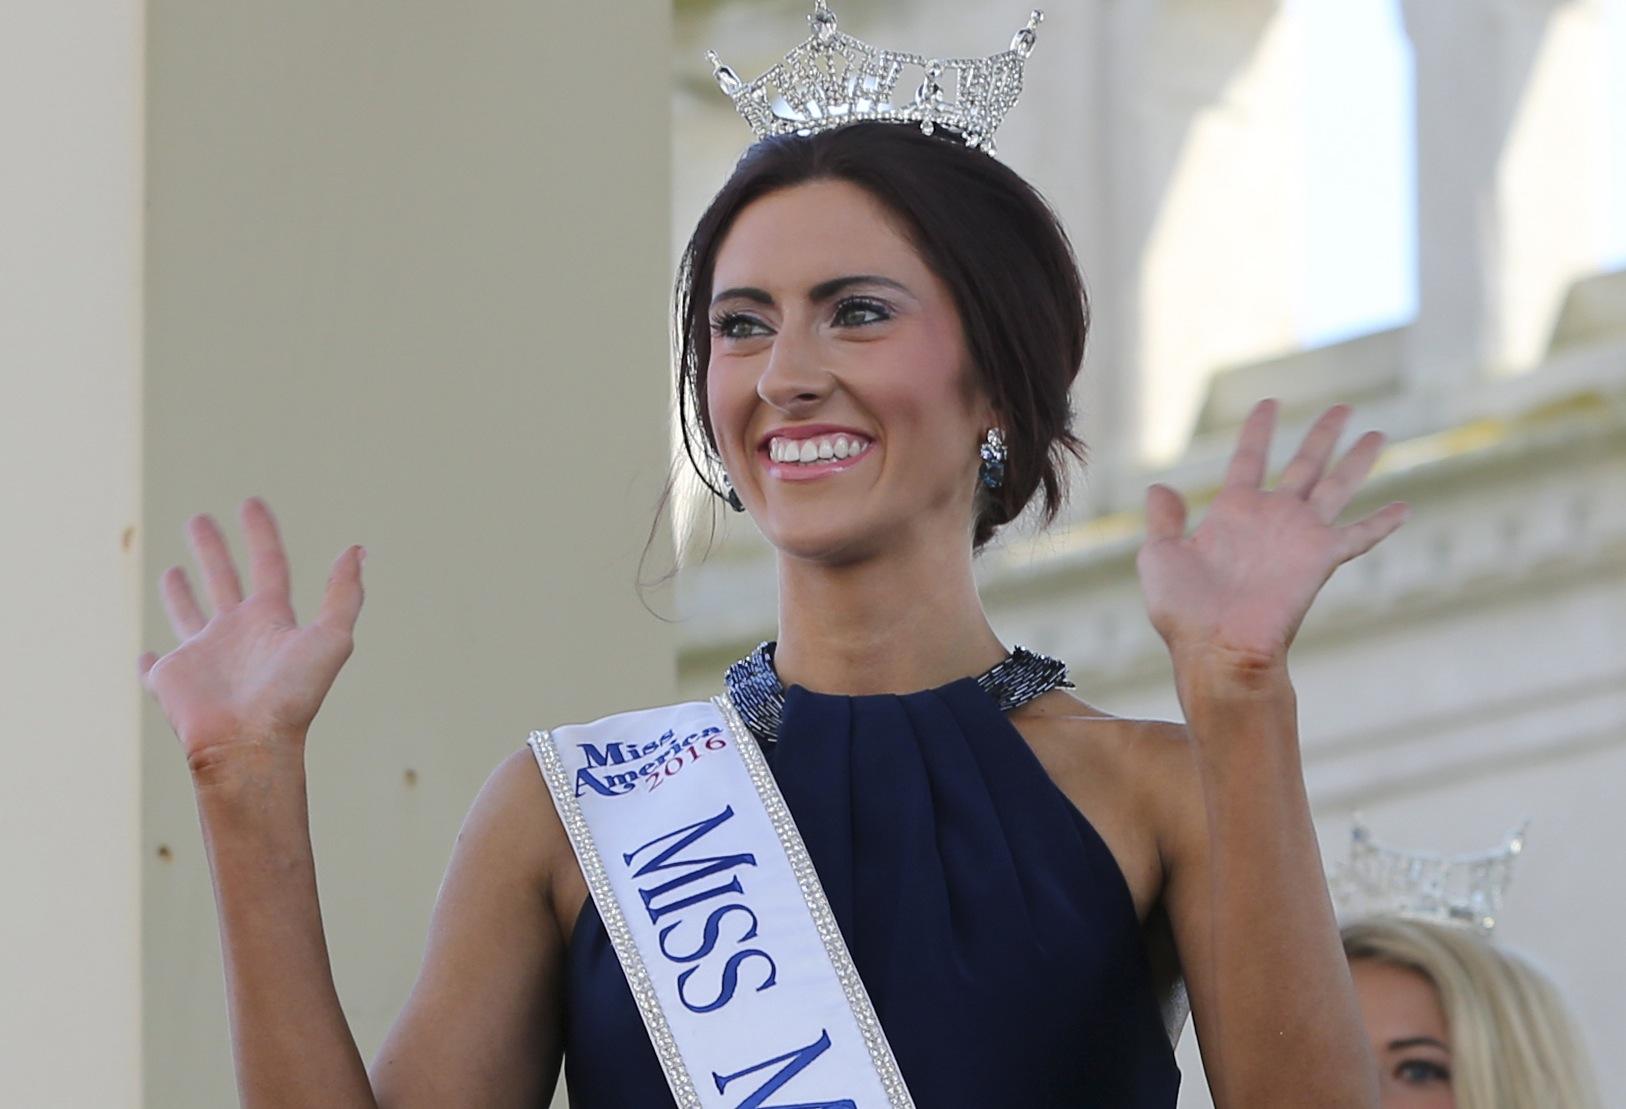 Erin O'Flaherty